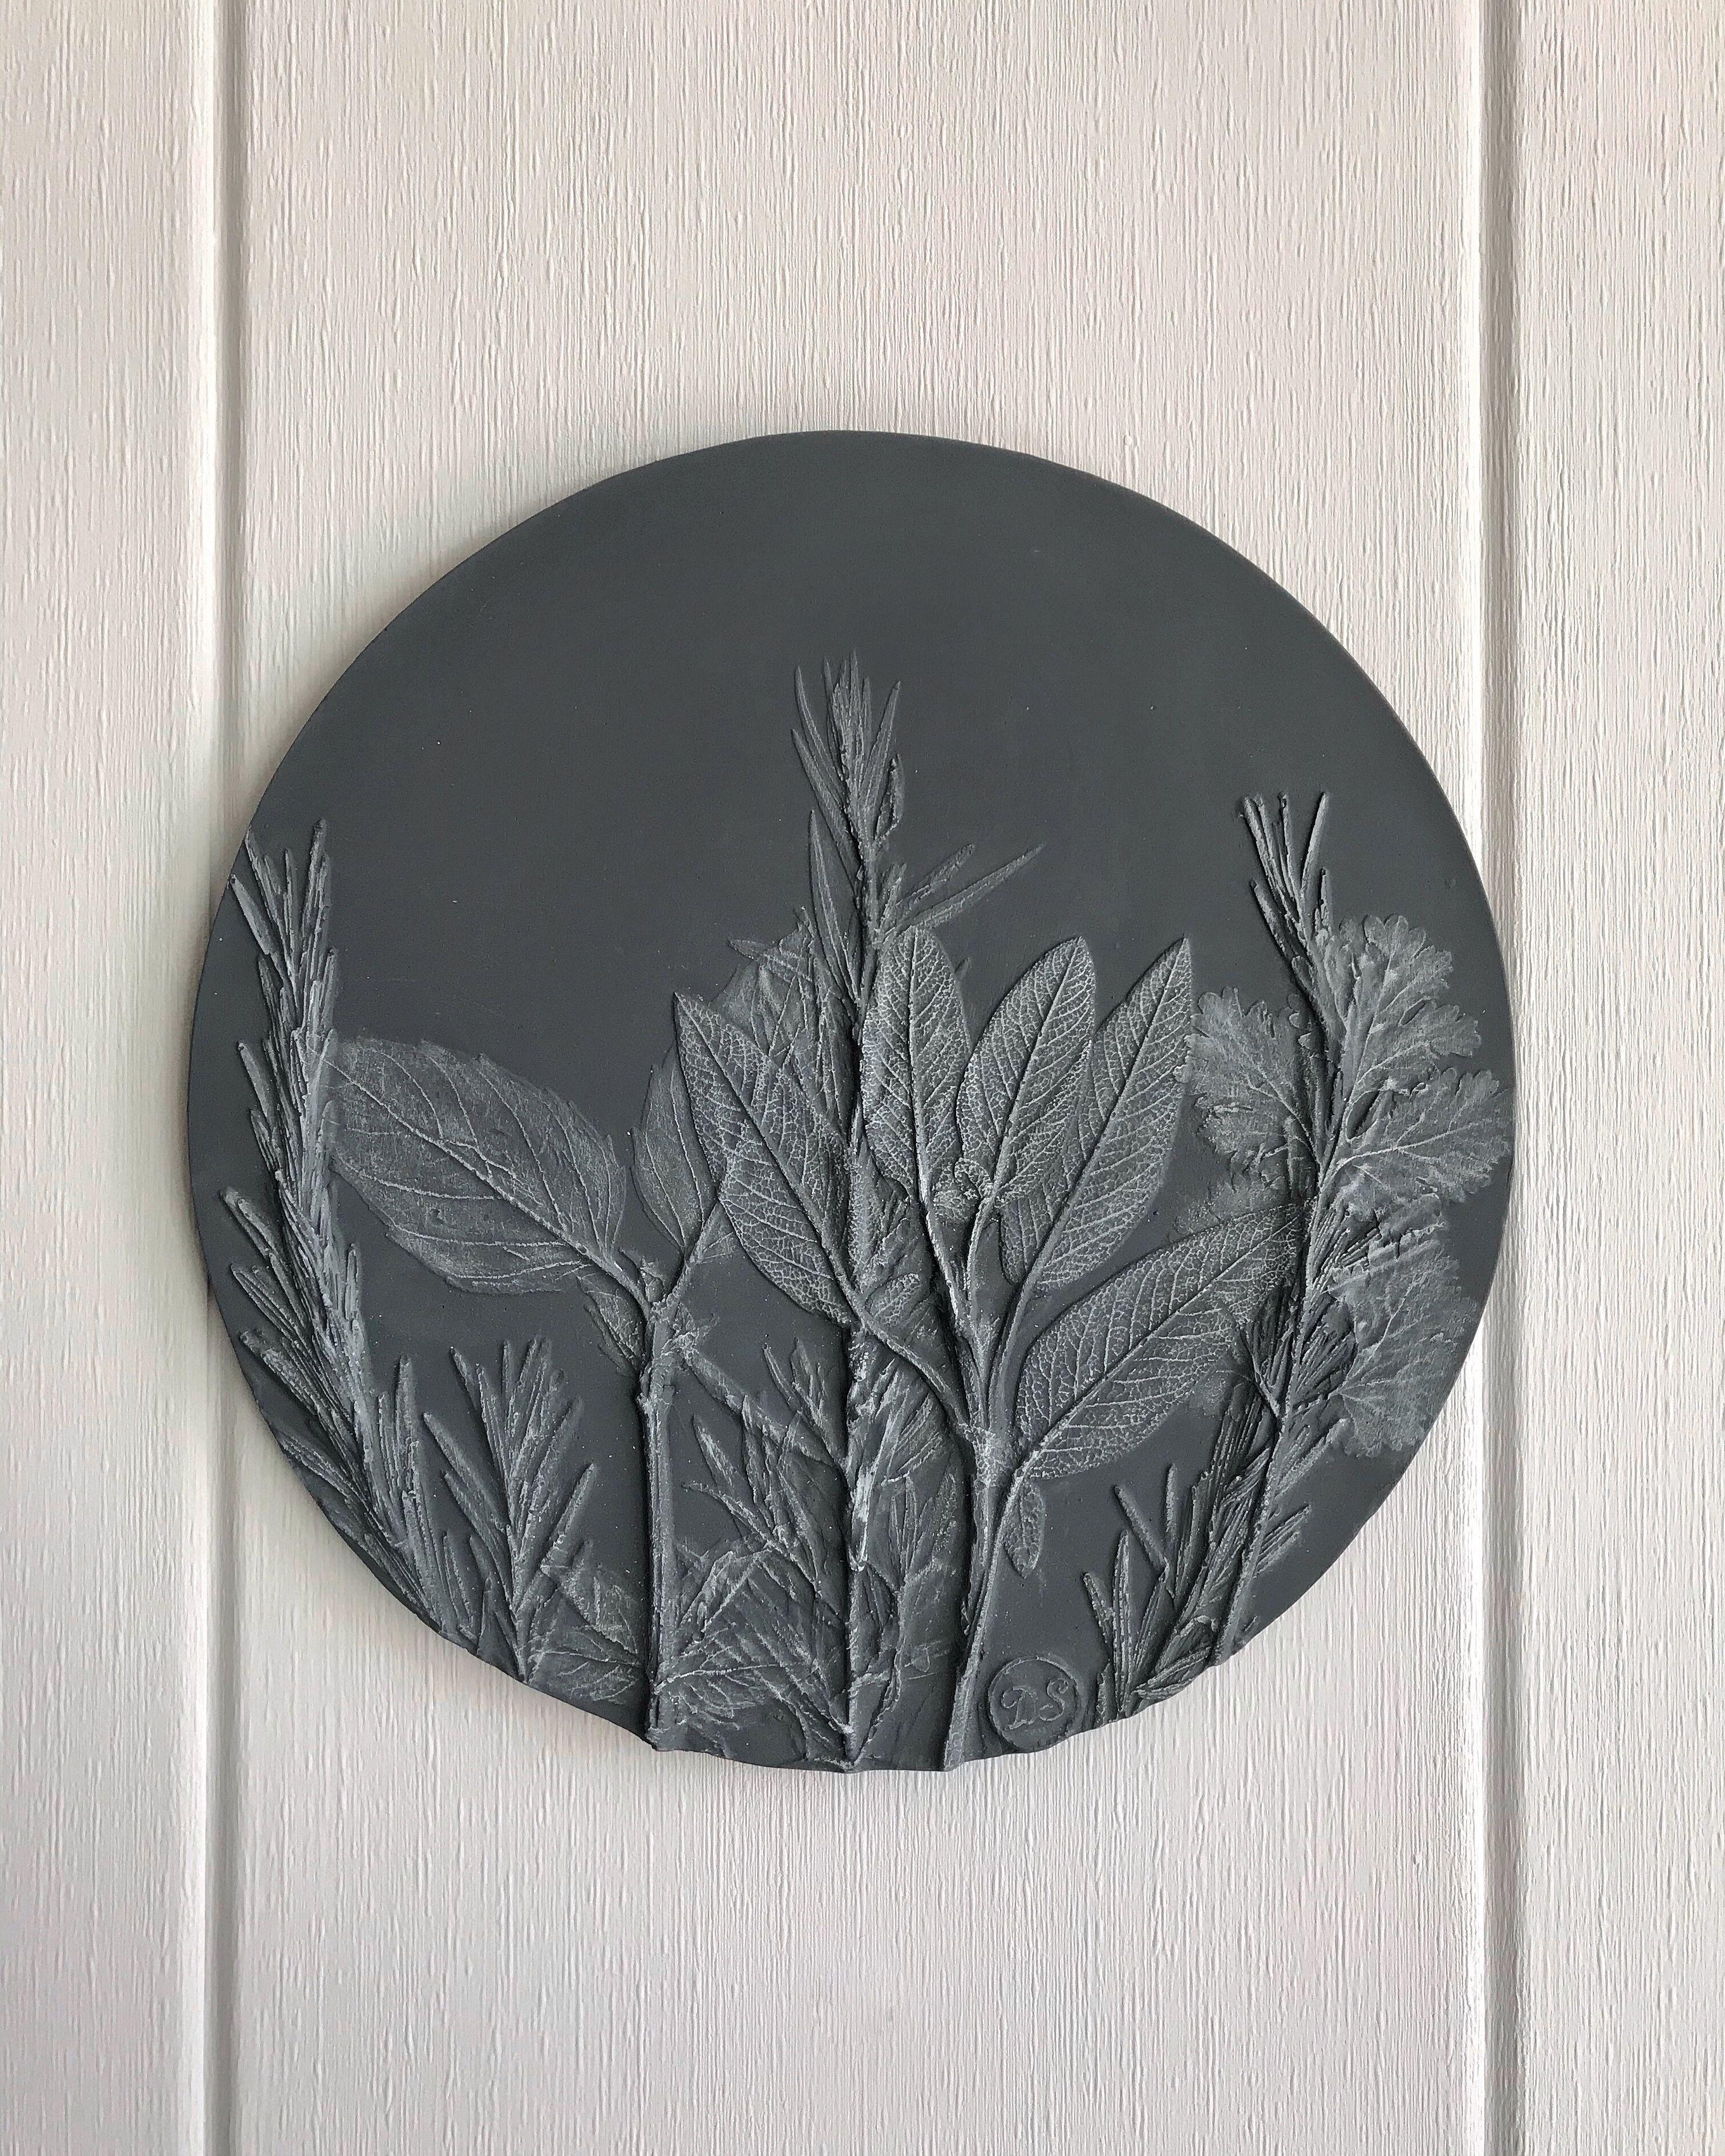 Unique Grey Botanical Bas Relief For Farmhouse Wall Decor Of